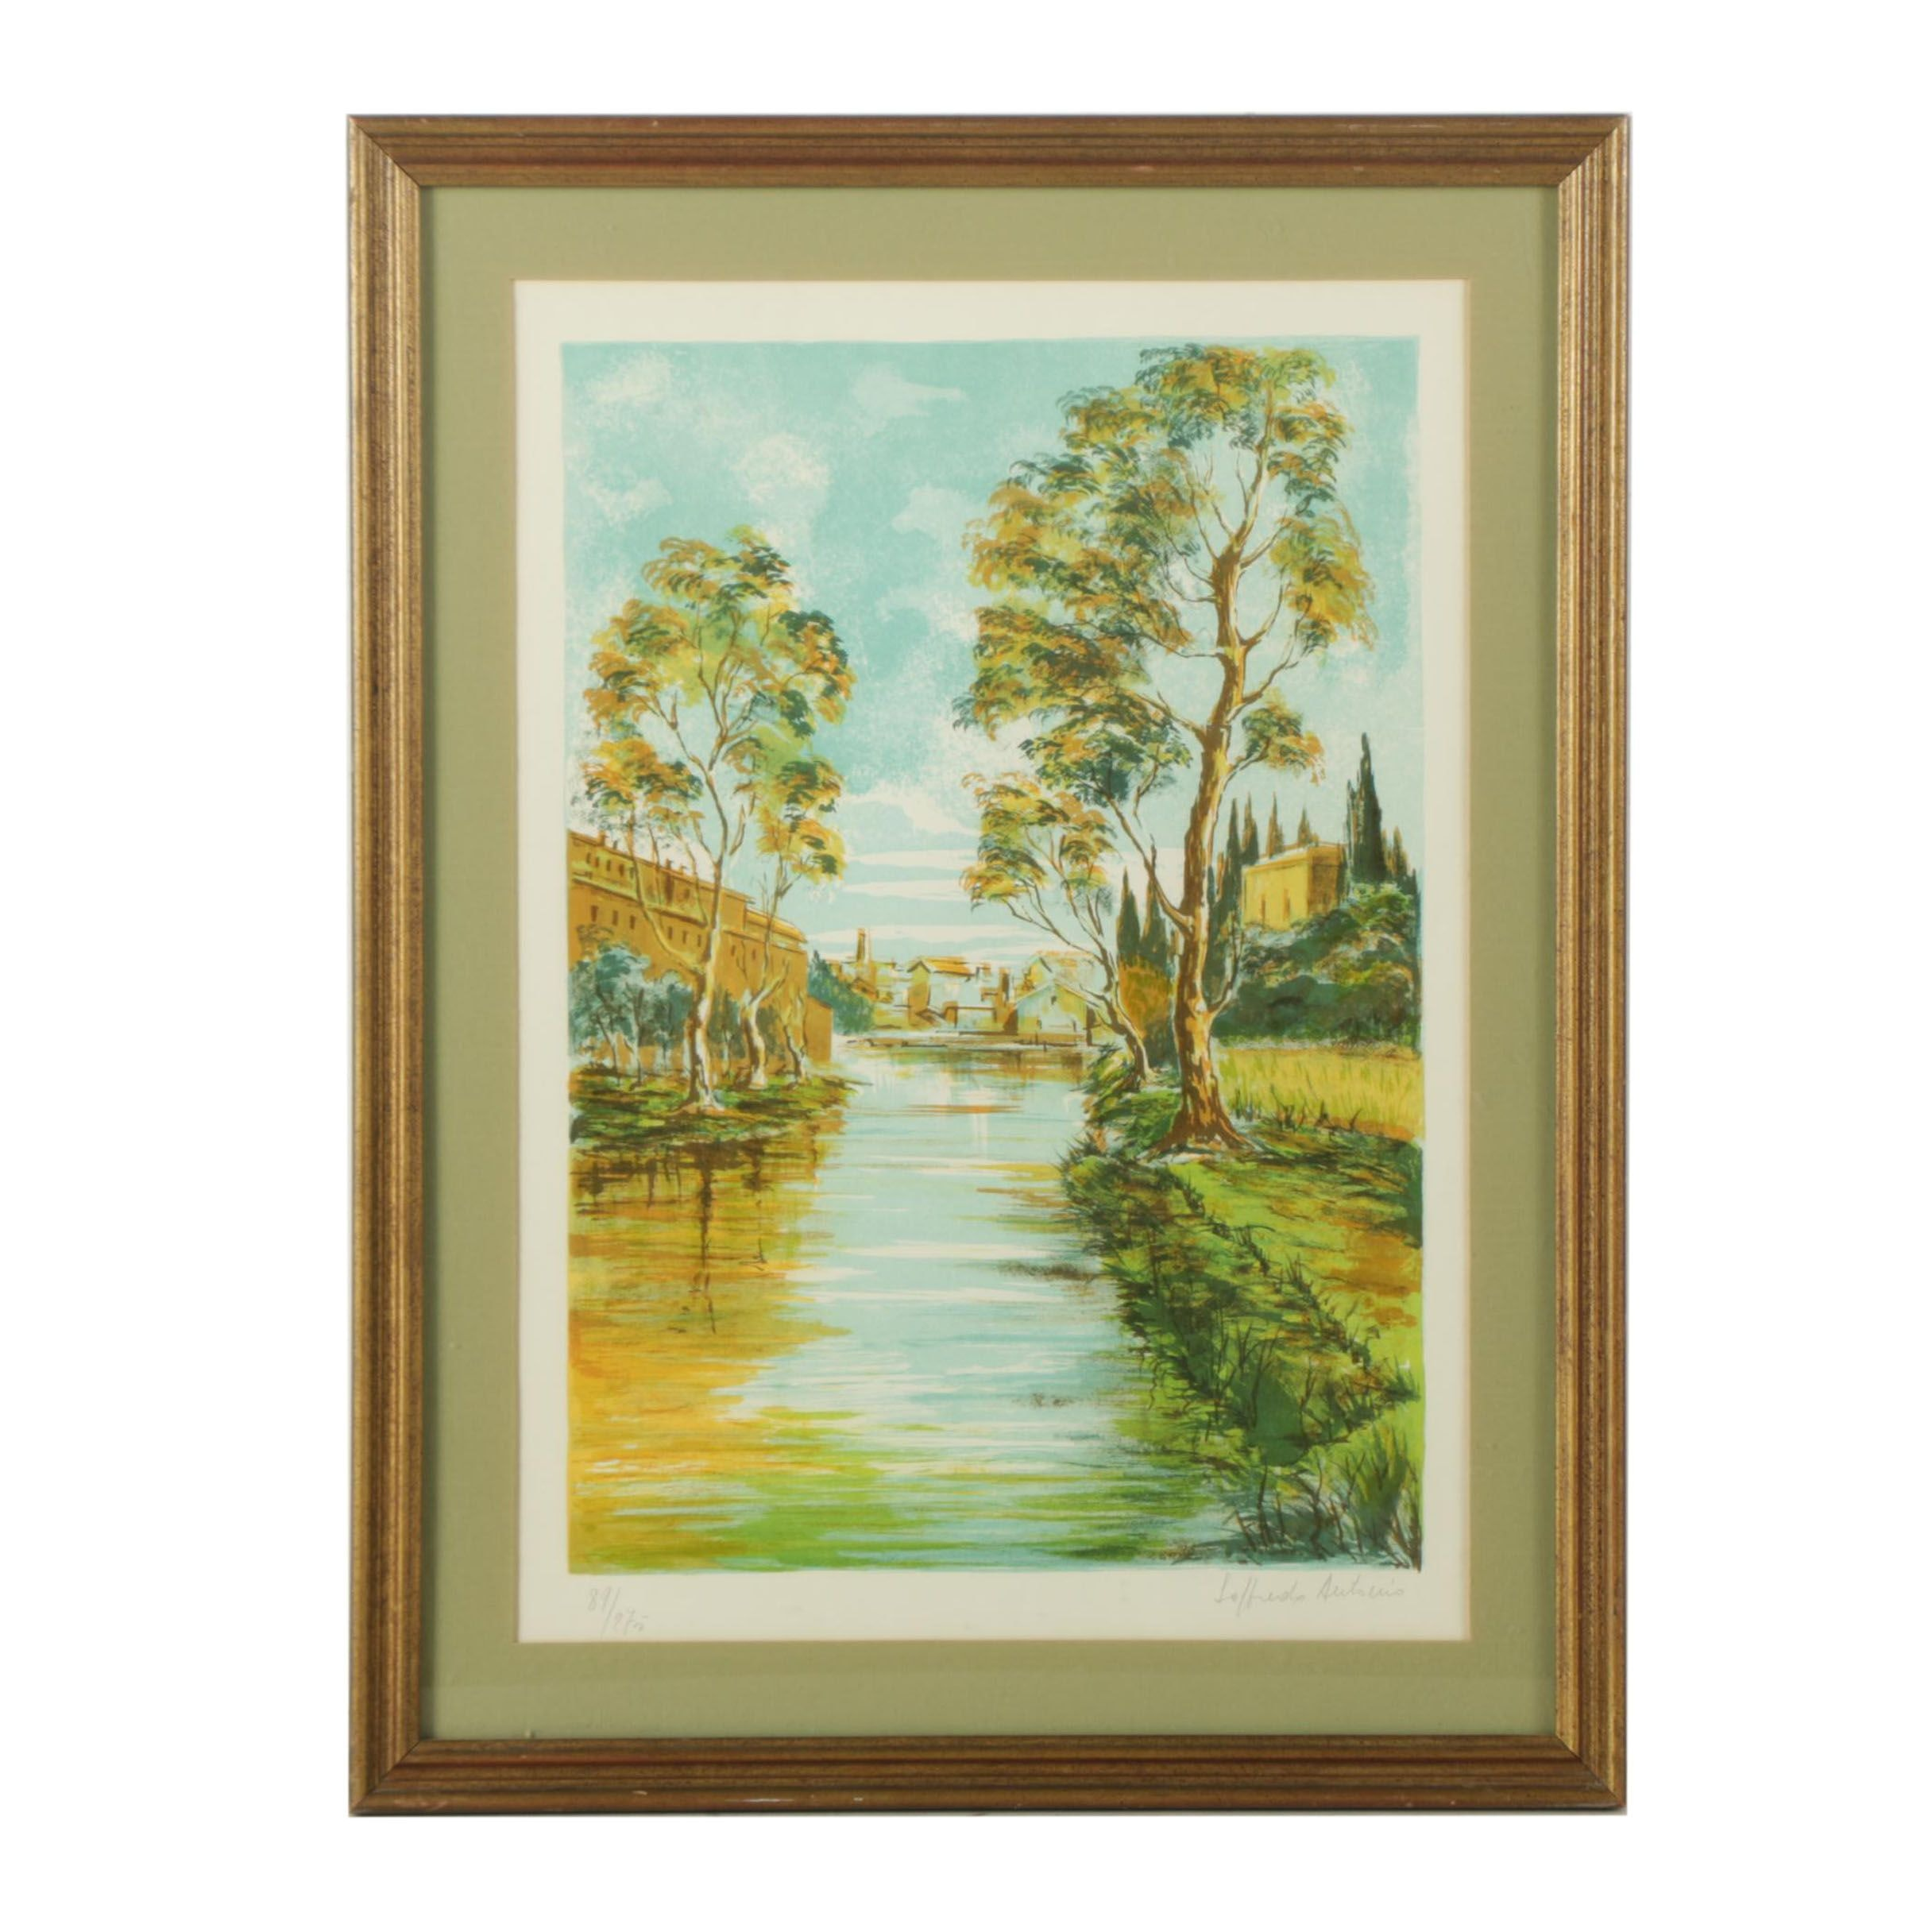 Antonio Loffredo Limited Edition Lithograph Waterfront Landscape